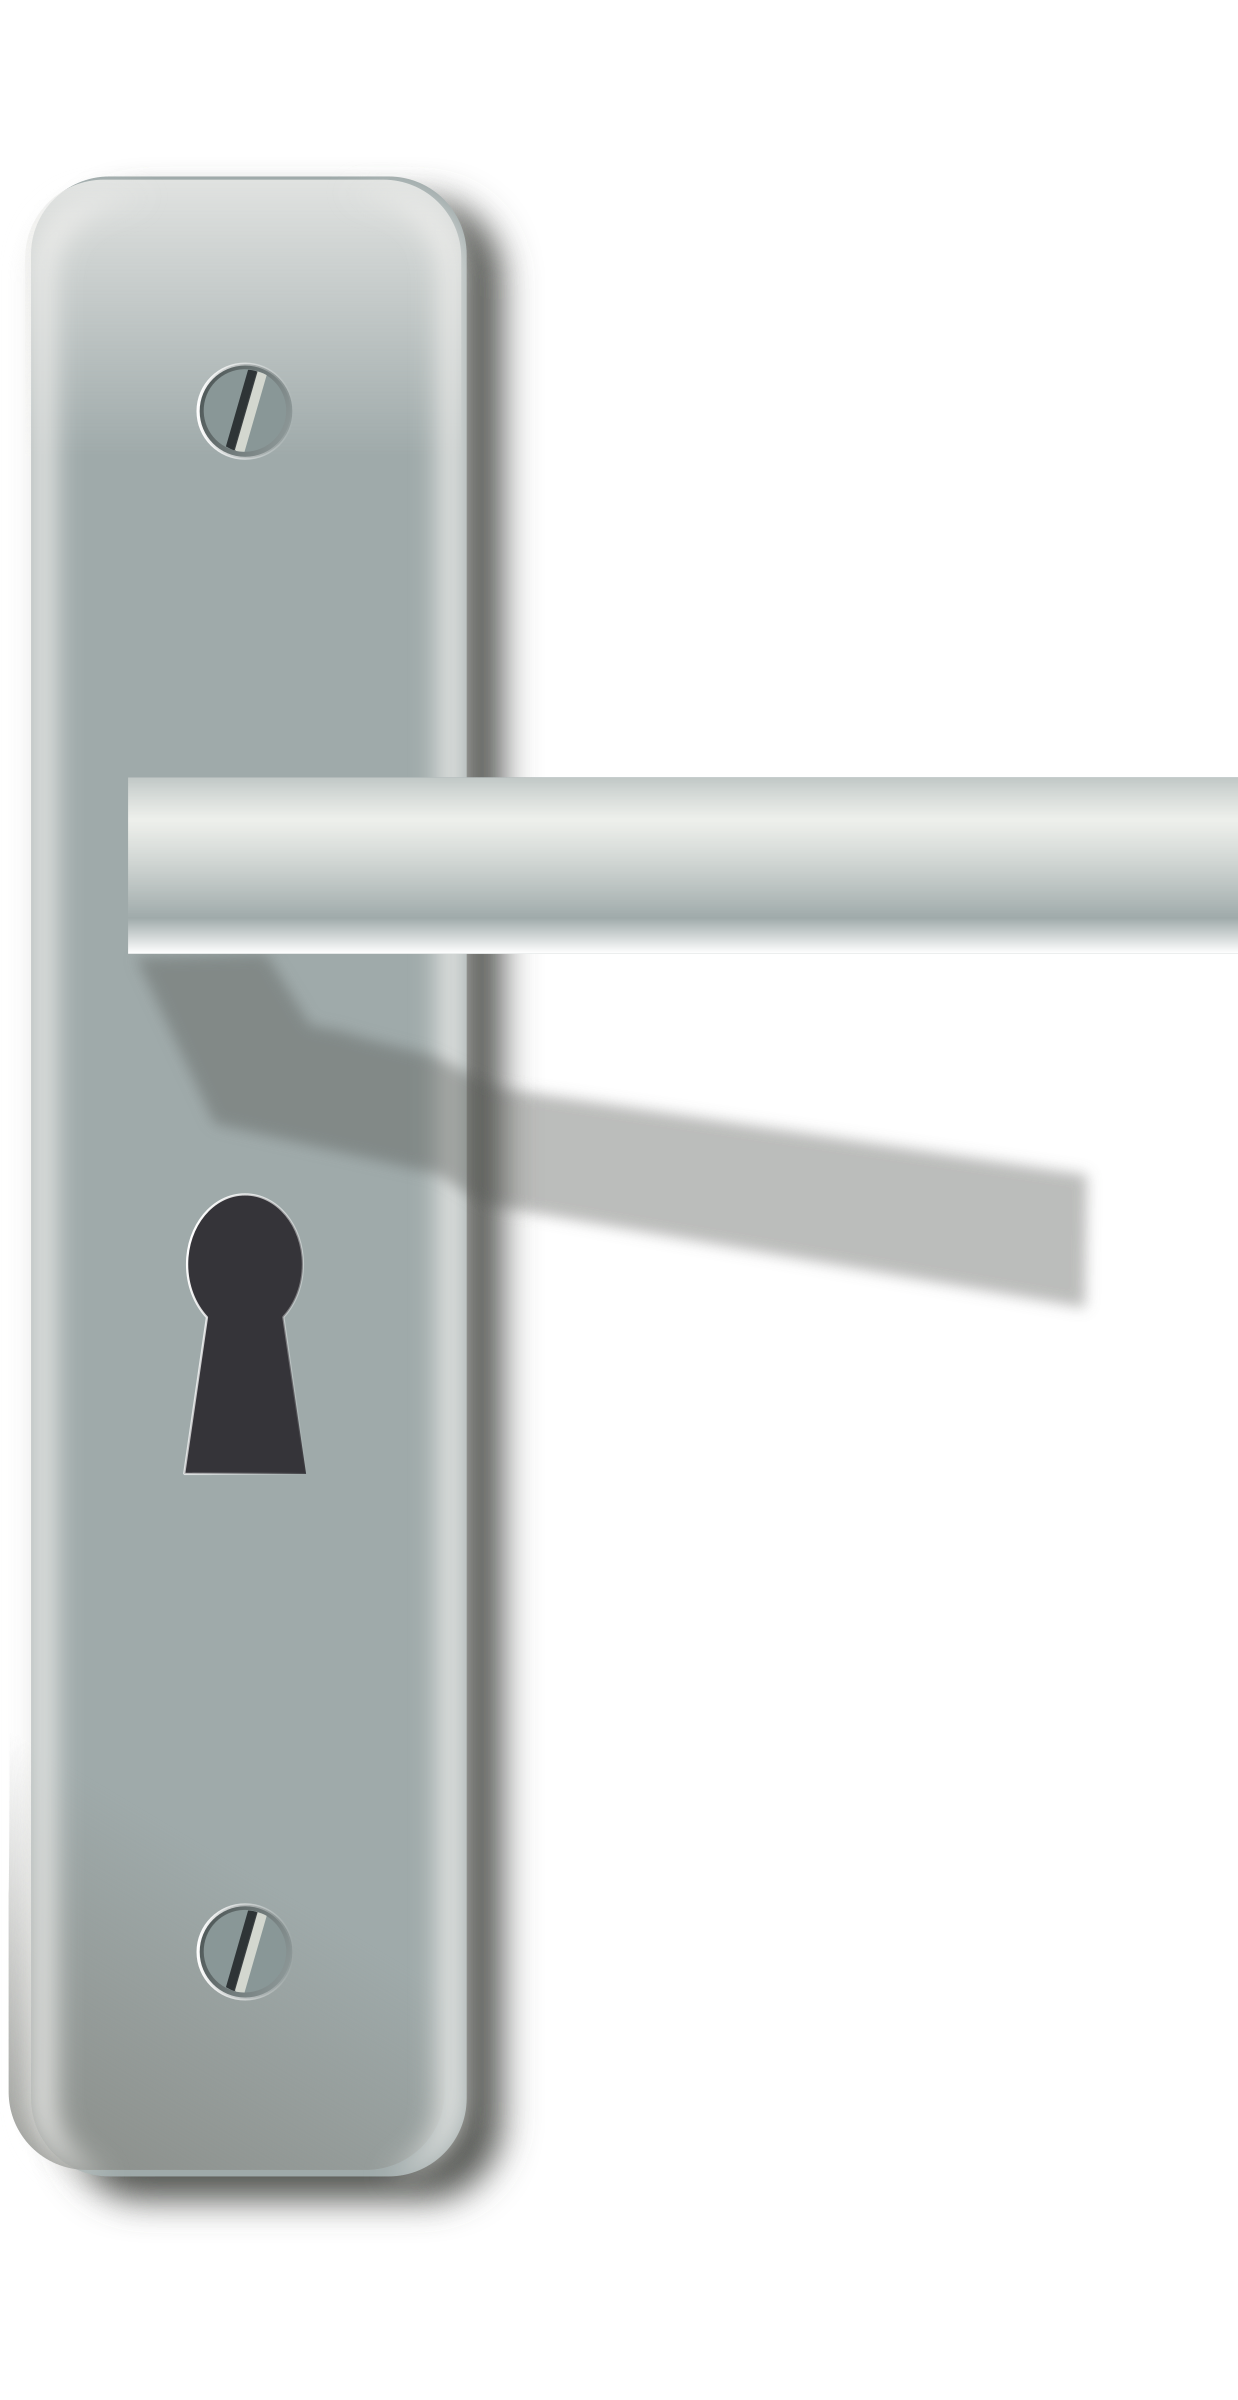 Door home furniture design. Clipart car handle